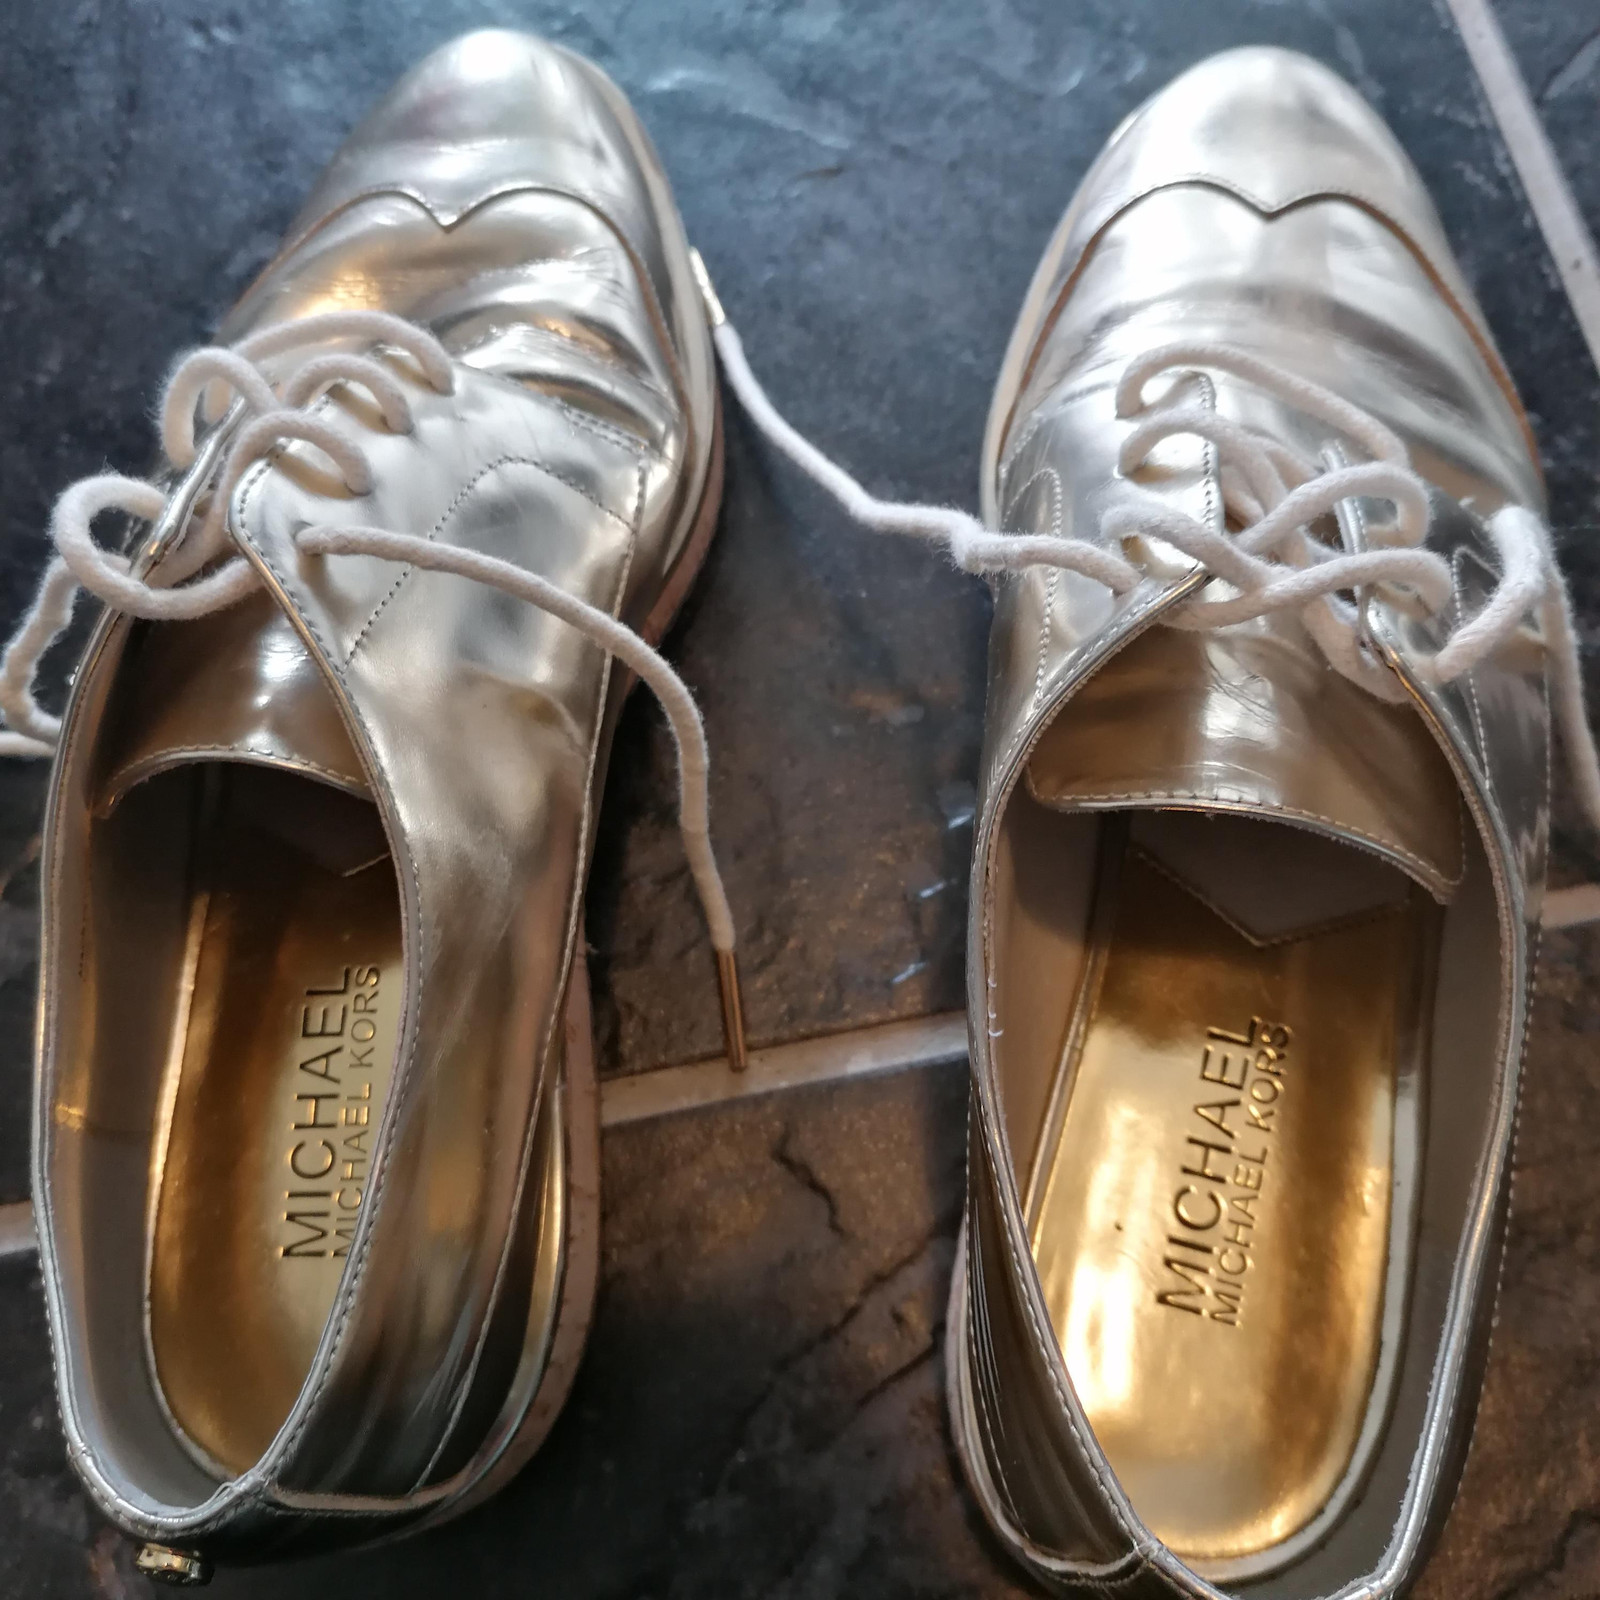 Michael Kors sko gull kilehæl | FINN.no